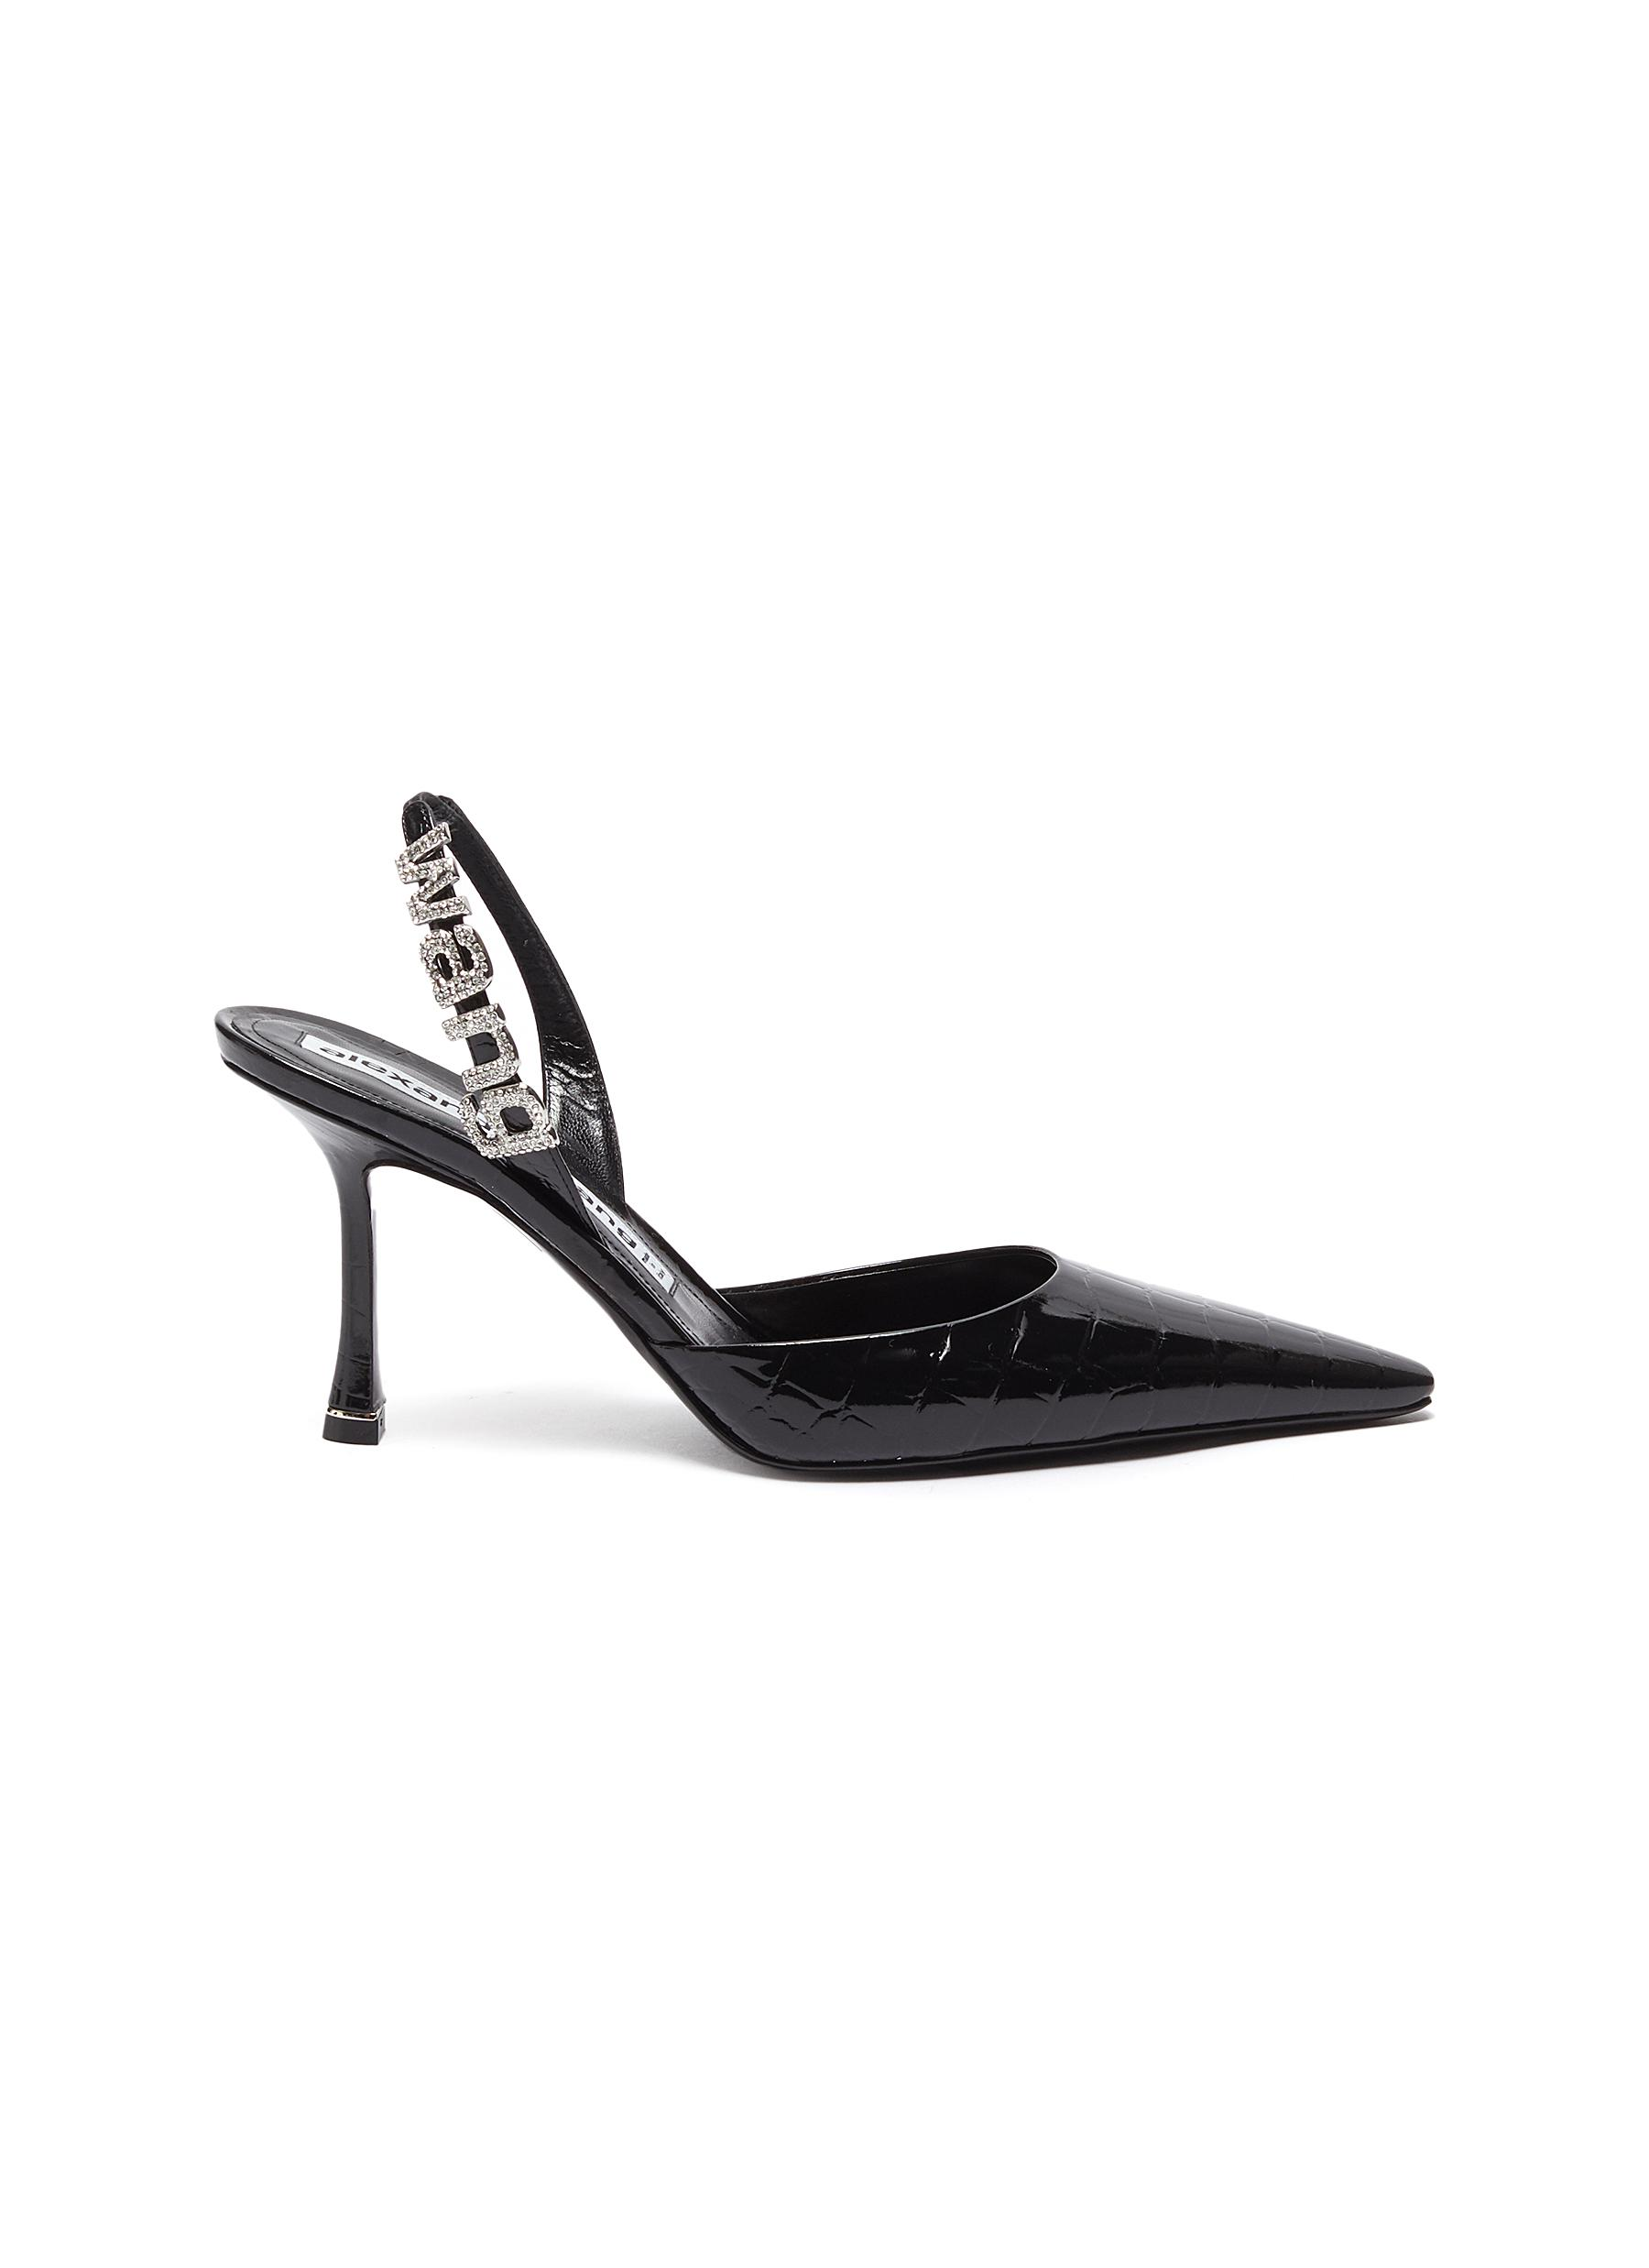 Alexander Wang High Heels Grace croc embossed leather slingback pumps